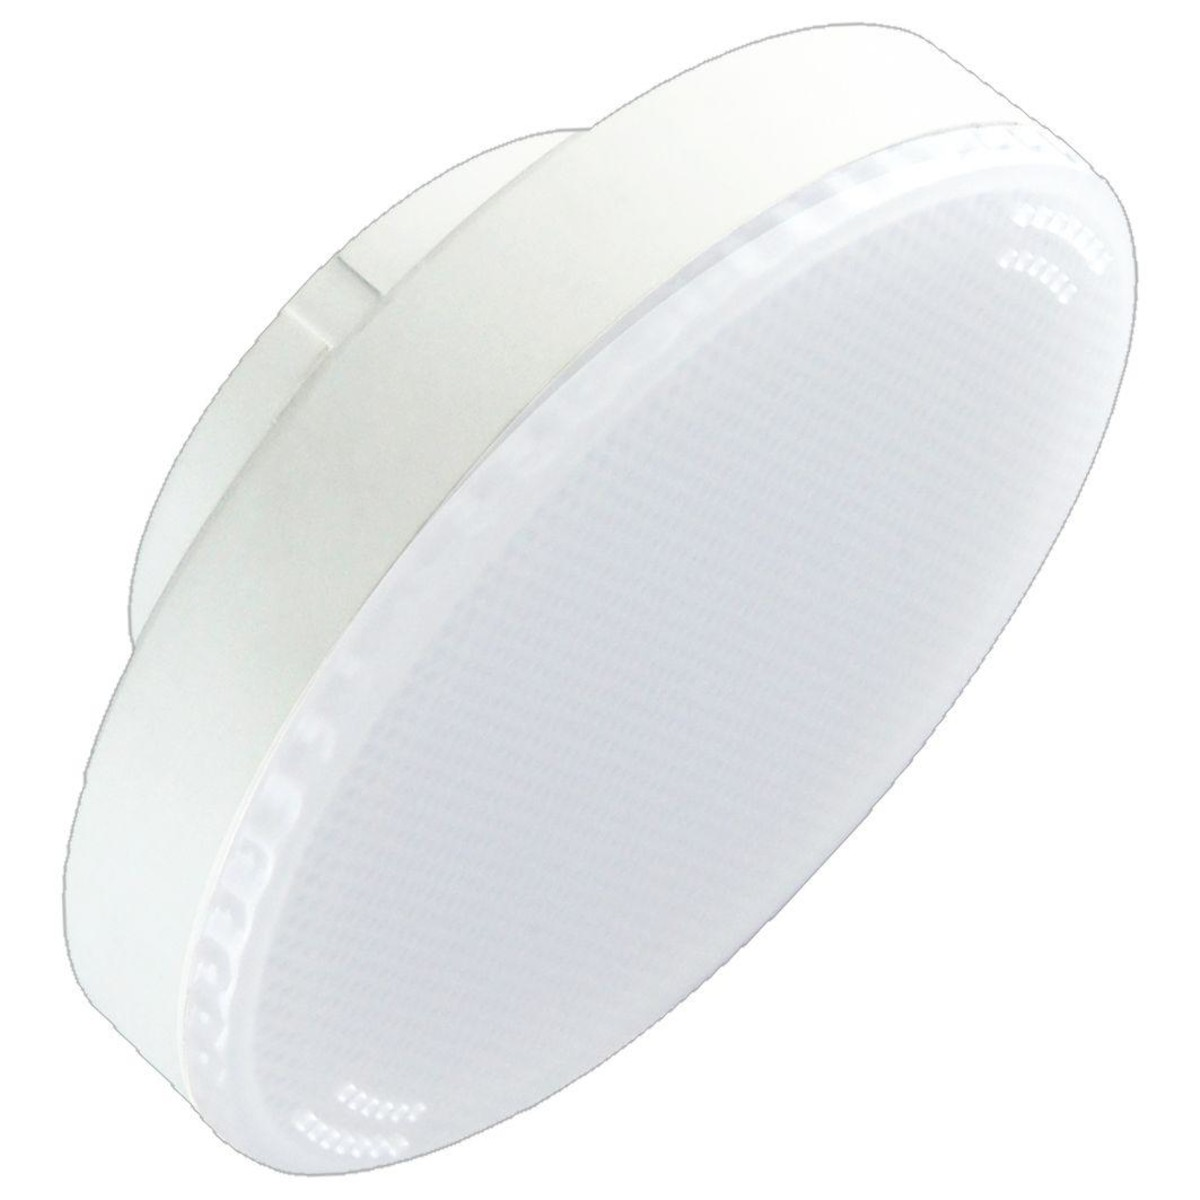 Лампа Ecola light GX53 6 Вт таблетка 480 Лм теплый 10 шт